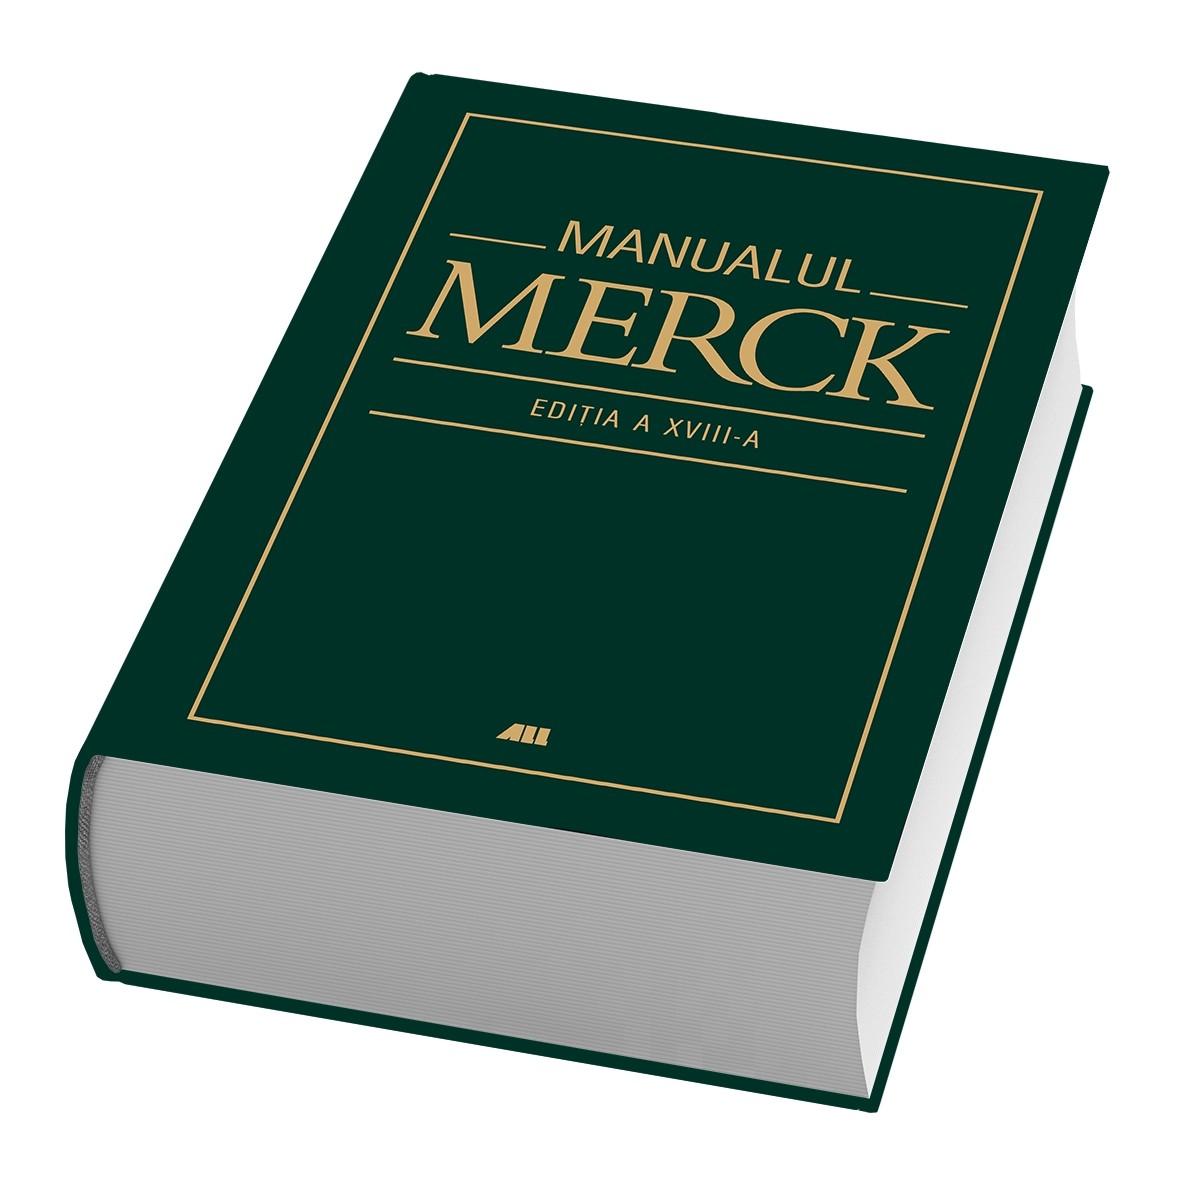 Manualul Merck 88 de simptome frecvente